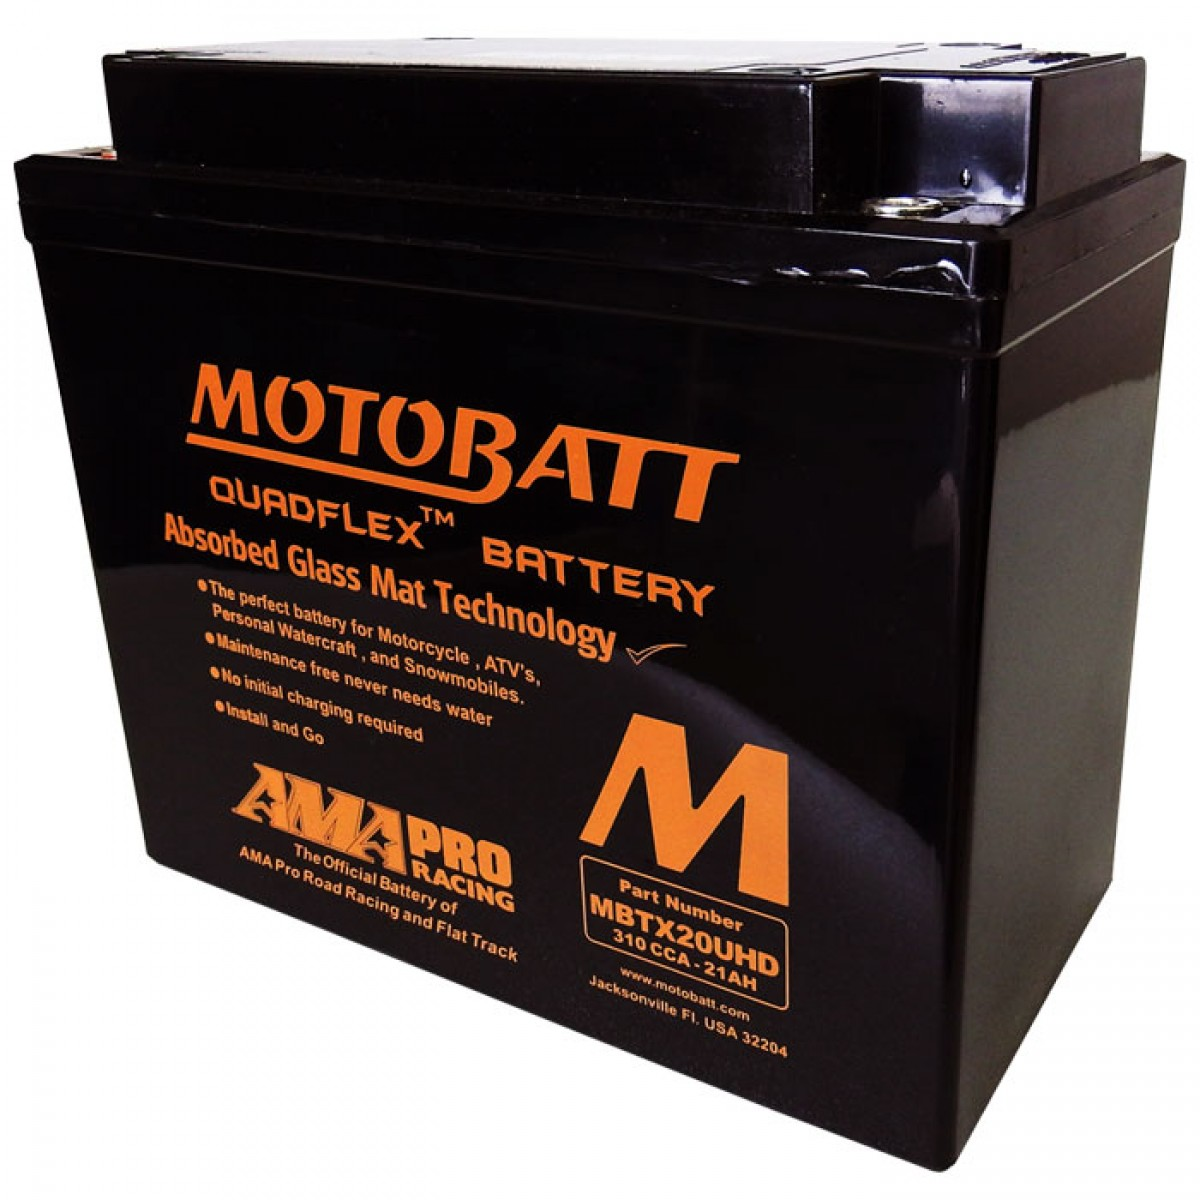 bateria MBTX20U-HD motobatt